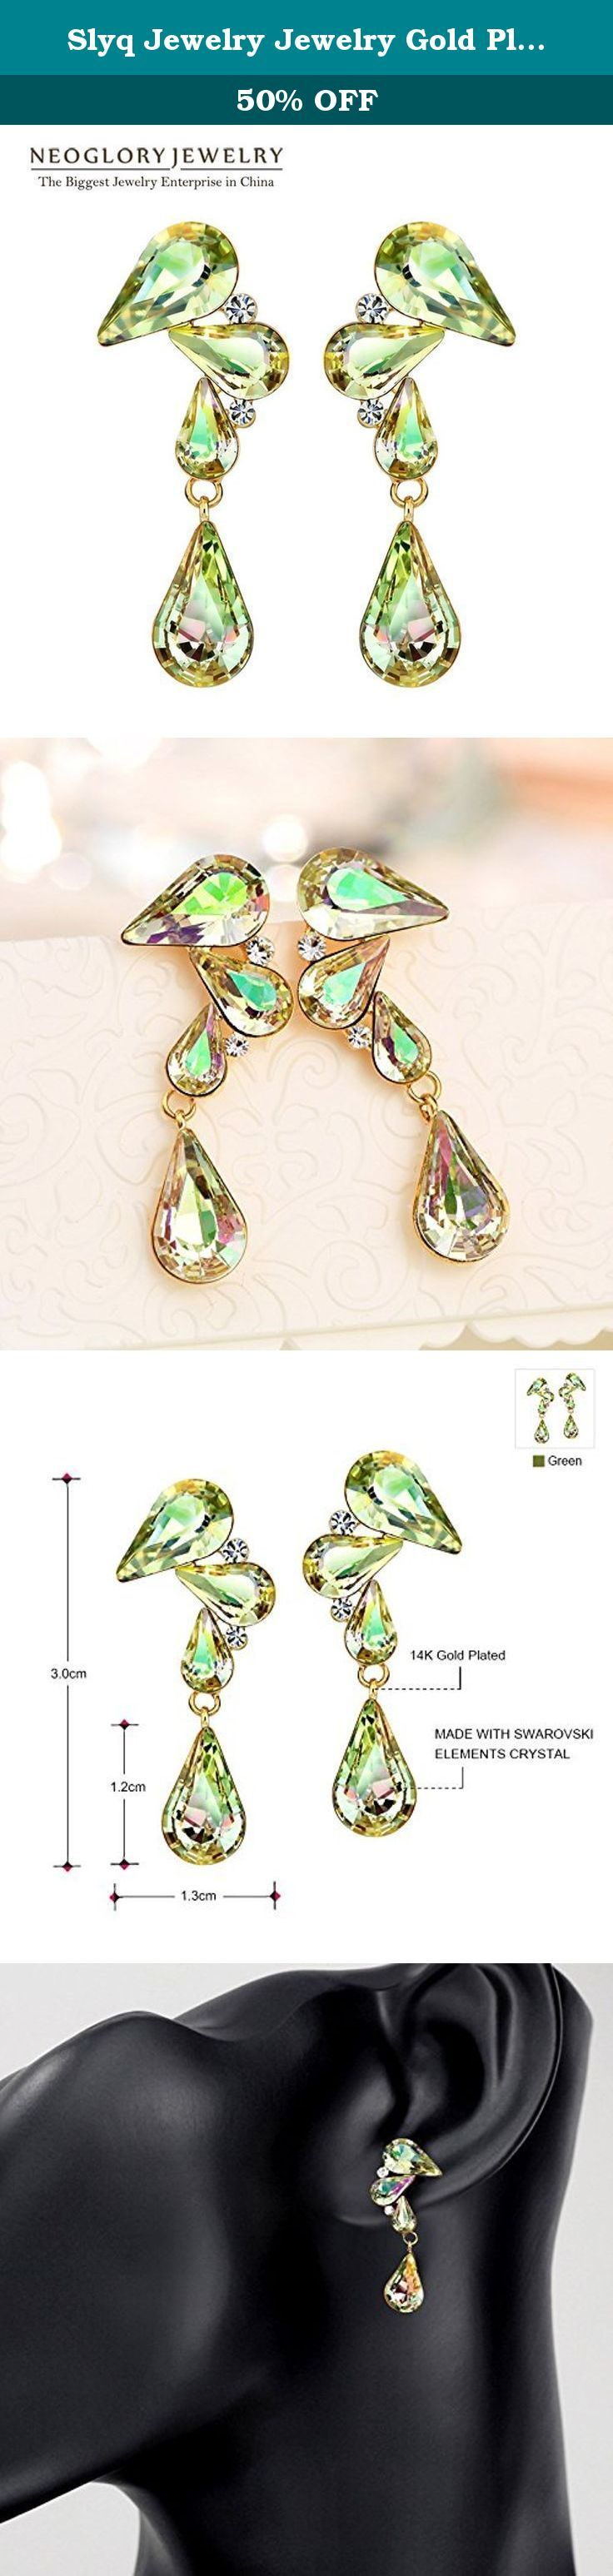 Slyq Jewelry Jewelry Gold Plated Green Austria Crystal Rhinestone Dangle Earring New Brand s. Slyq Jewelry Austria Crystal Wedding pendientes mujer silver Plated zircon Crystal Stud Earring Jewelry.